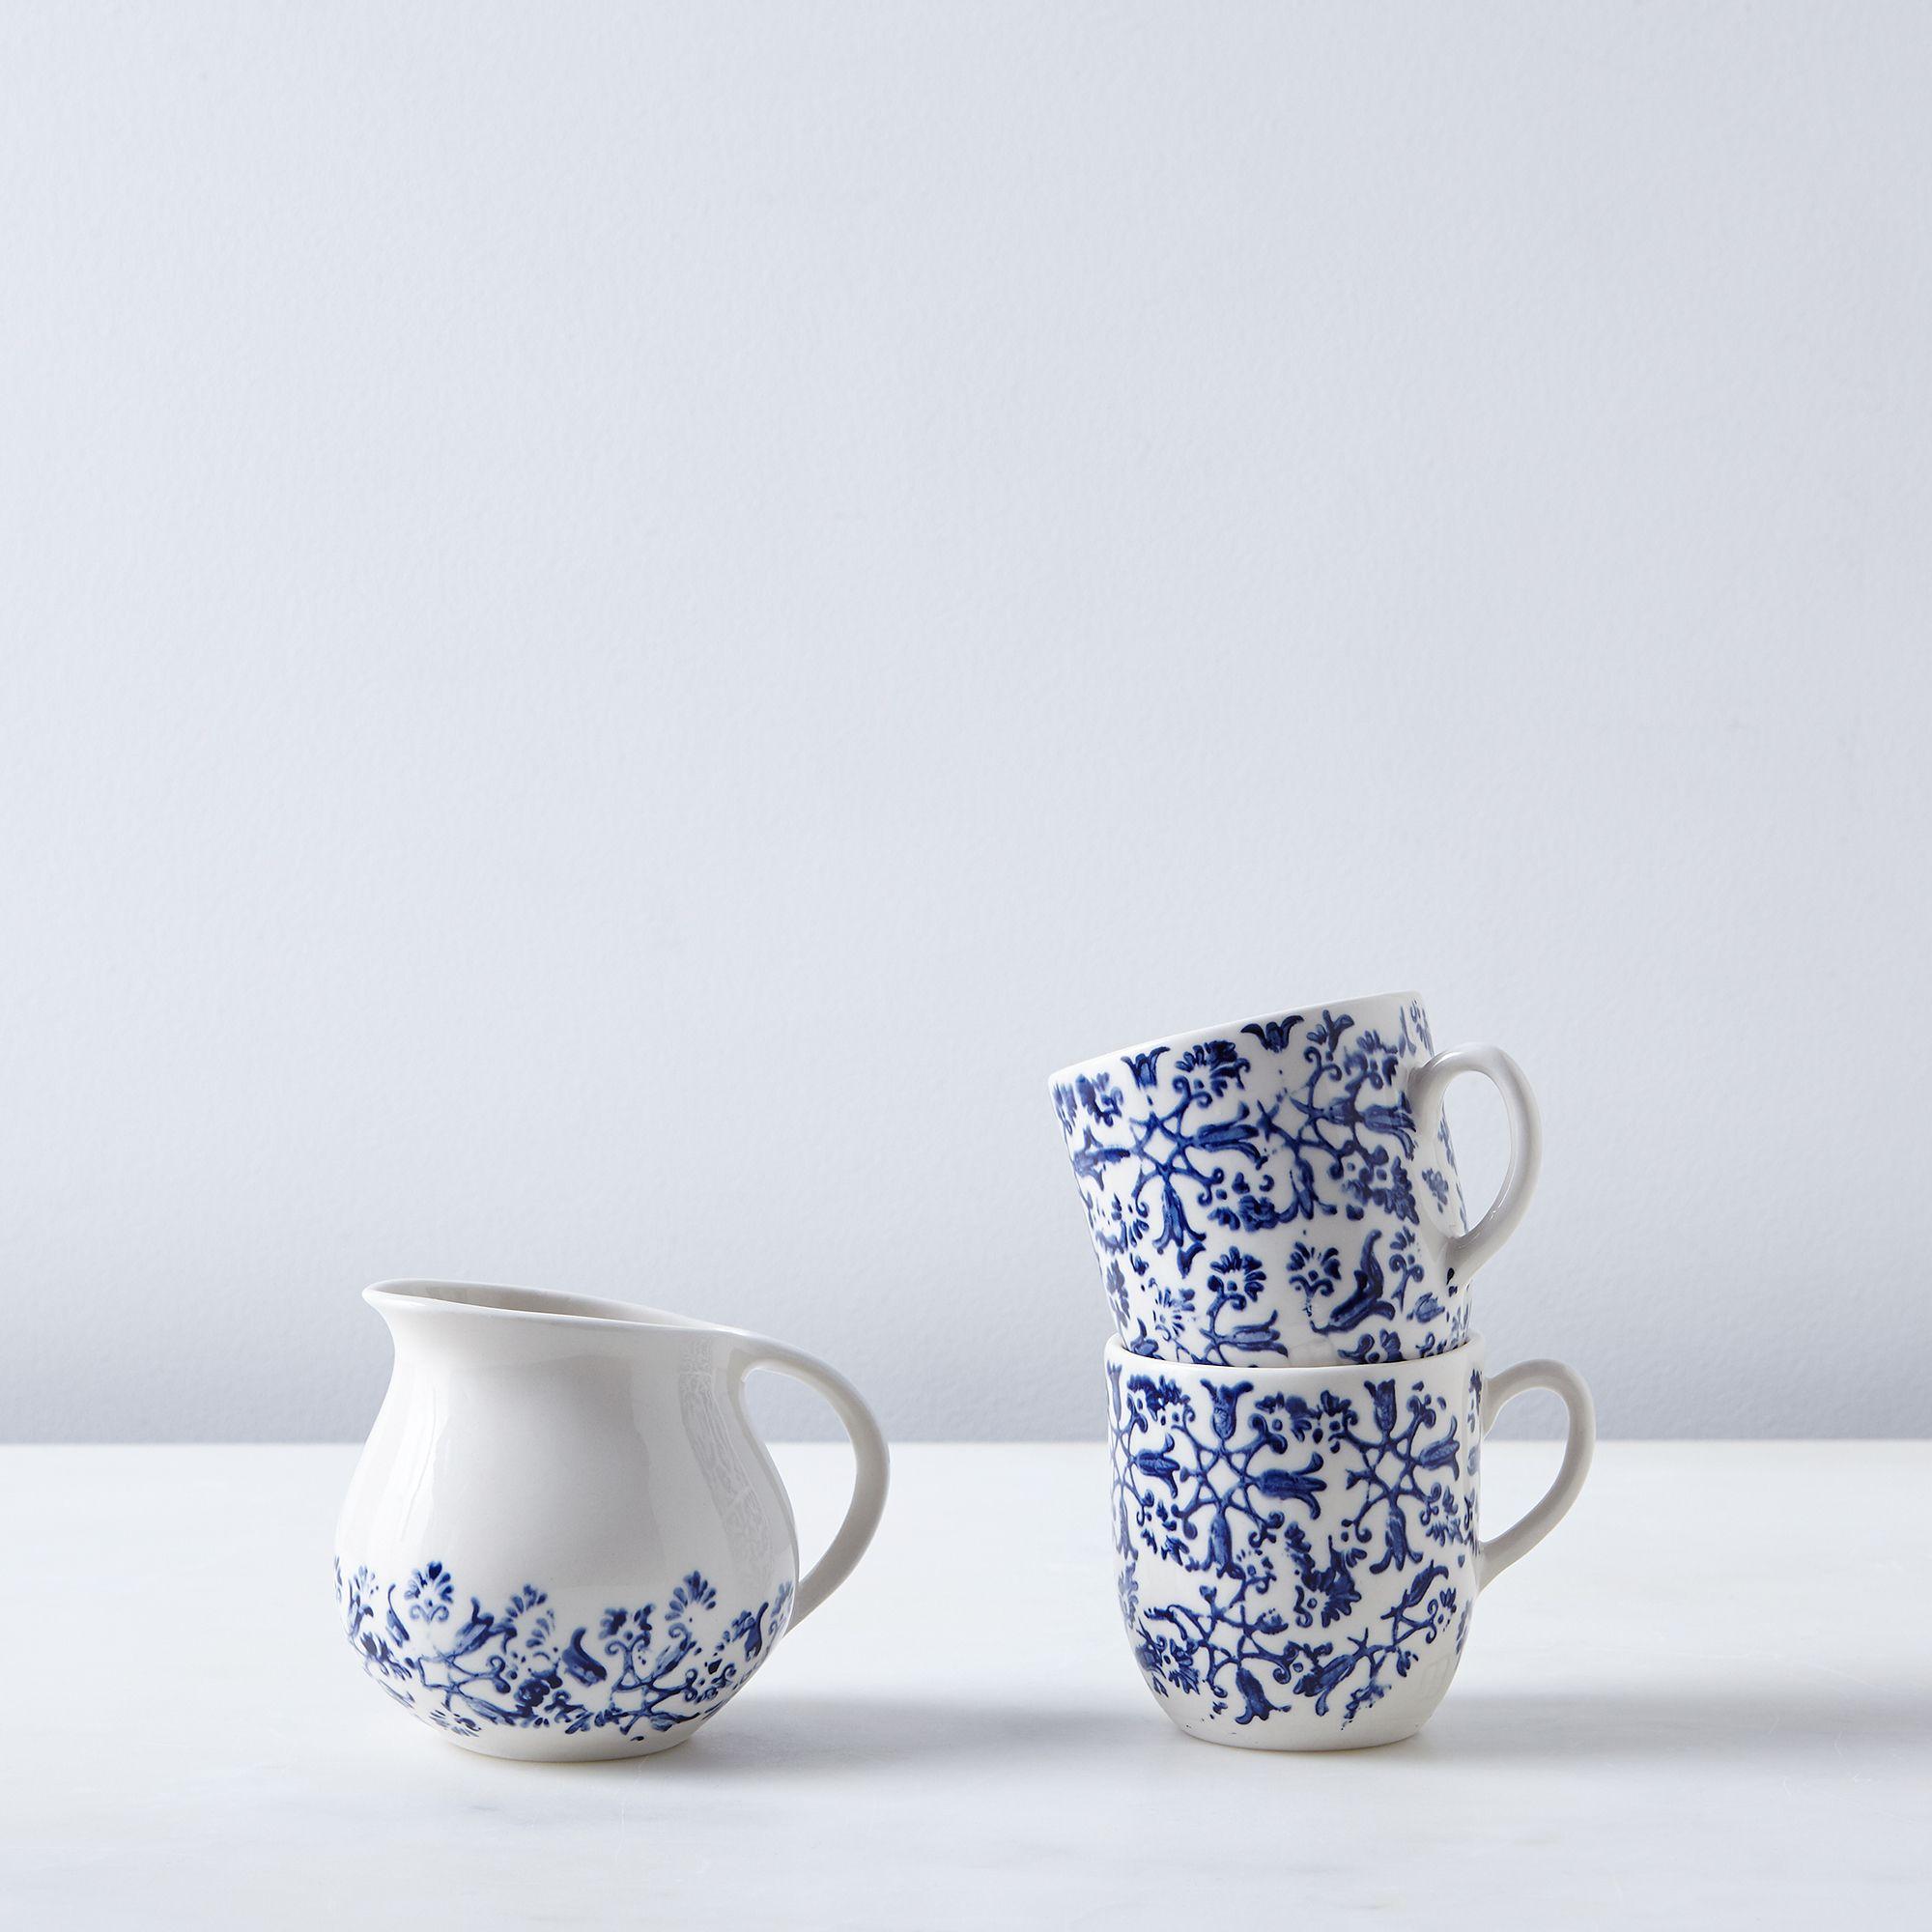 C16a8238 e192 4bab 8486 931e1157a7a9  2016 0610 art et manufacture floral cups and creamer floral silo rocky luten 002